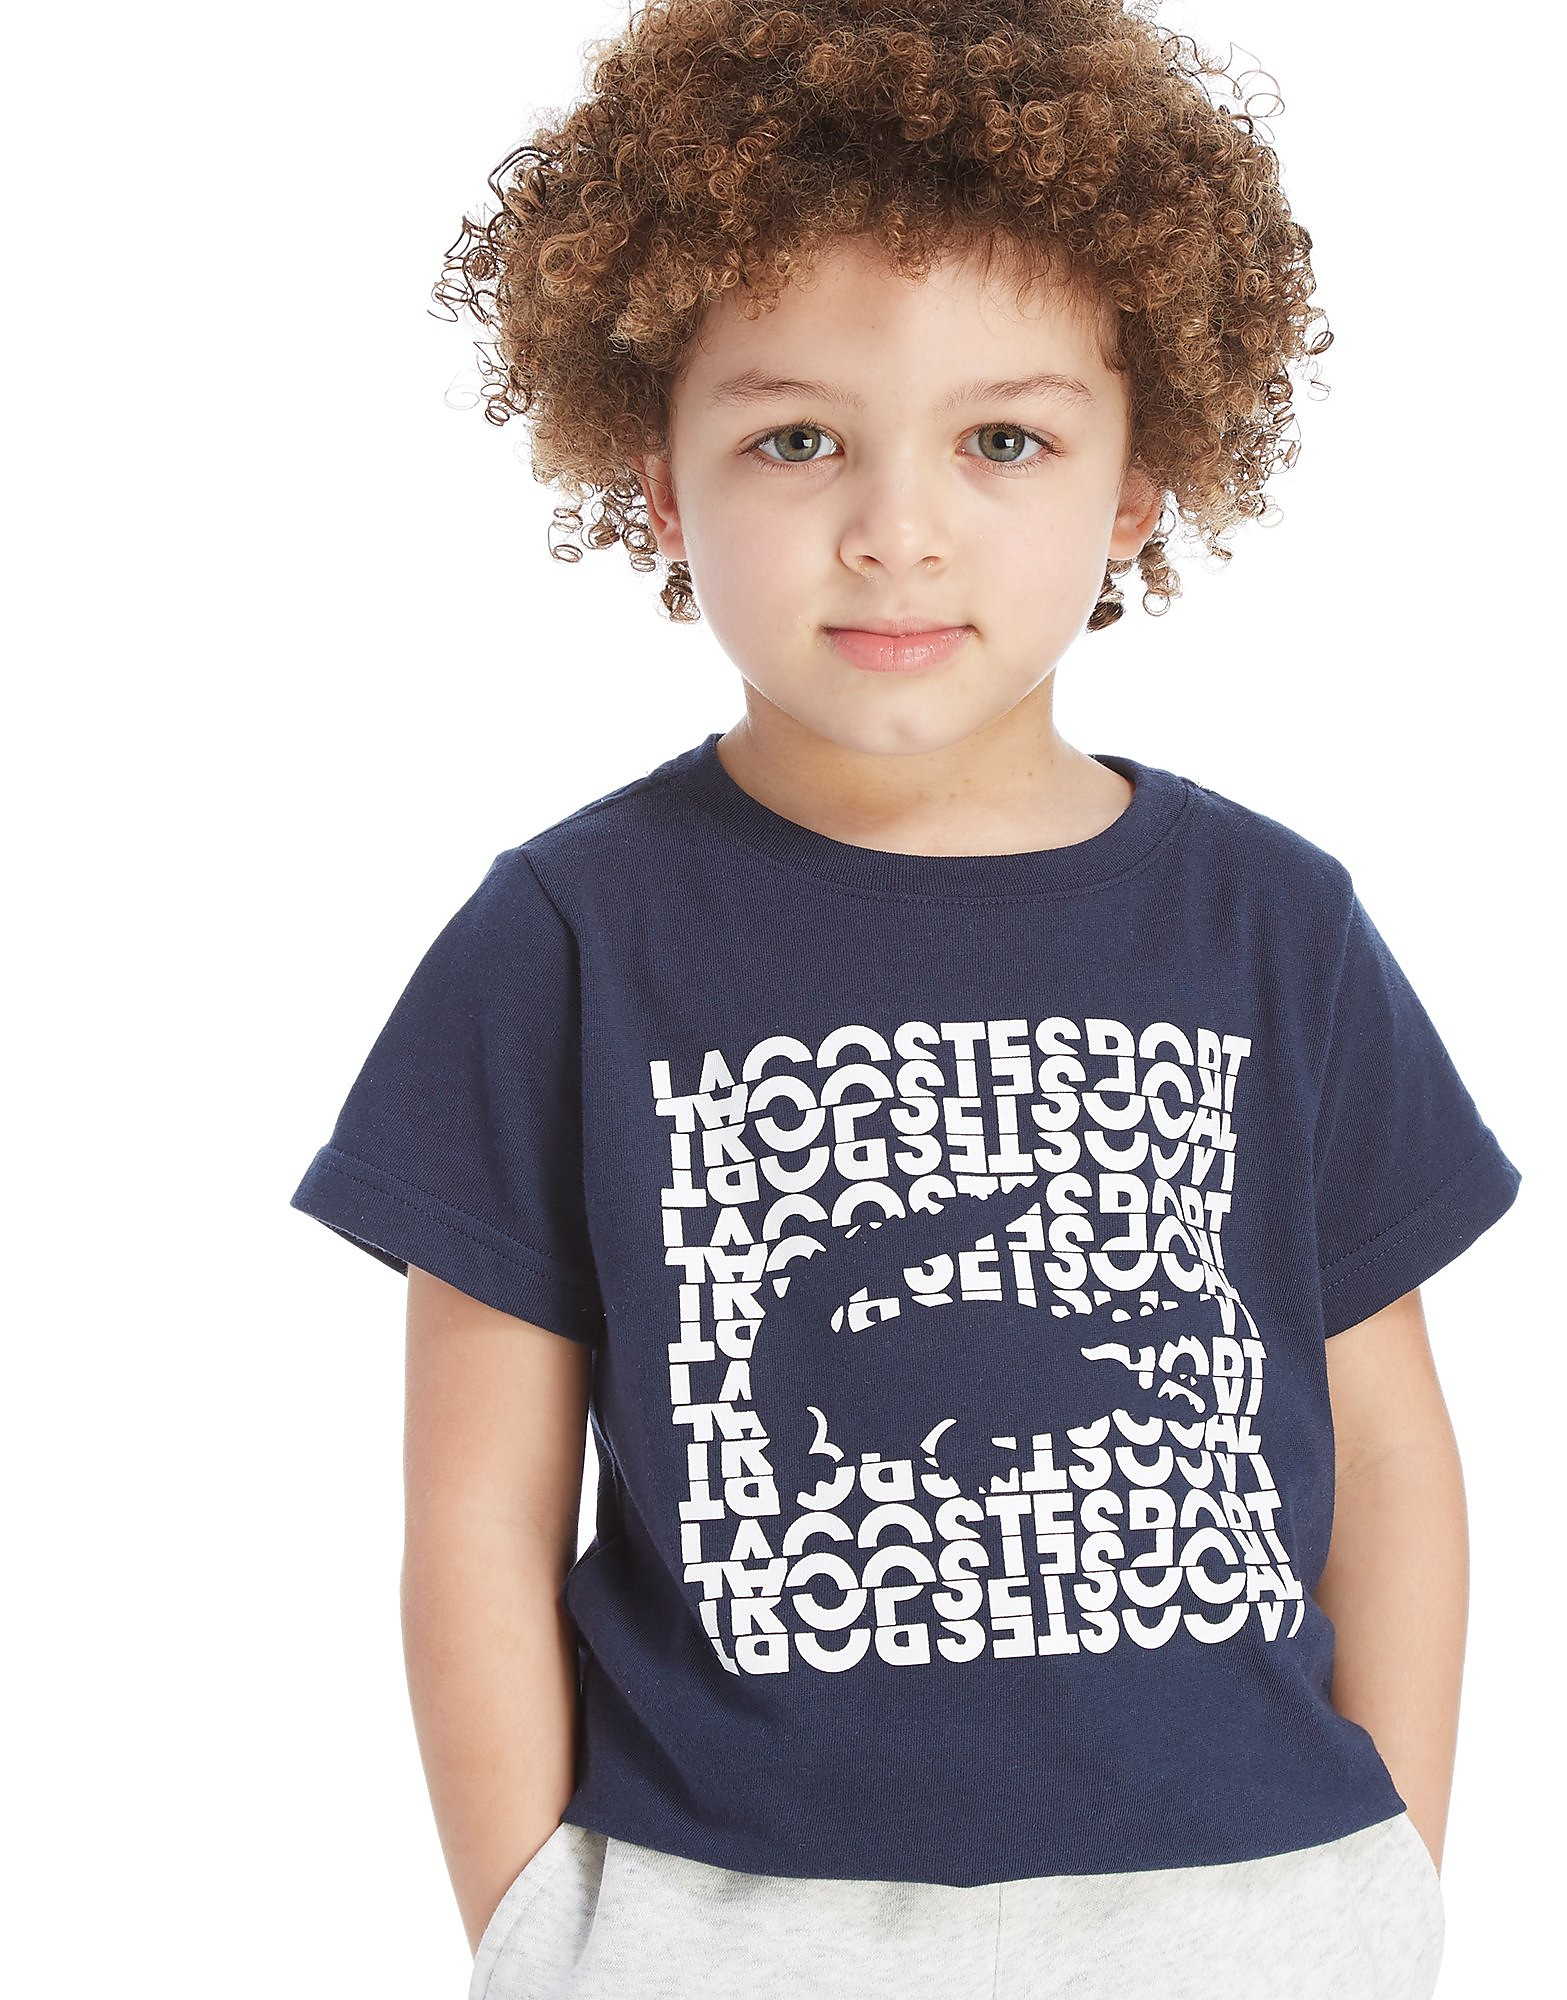 Lacoste Logo Croc T-Shirt Kinderen - Blauw - Kind